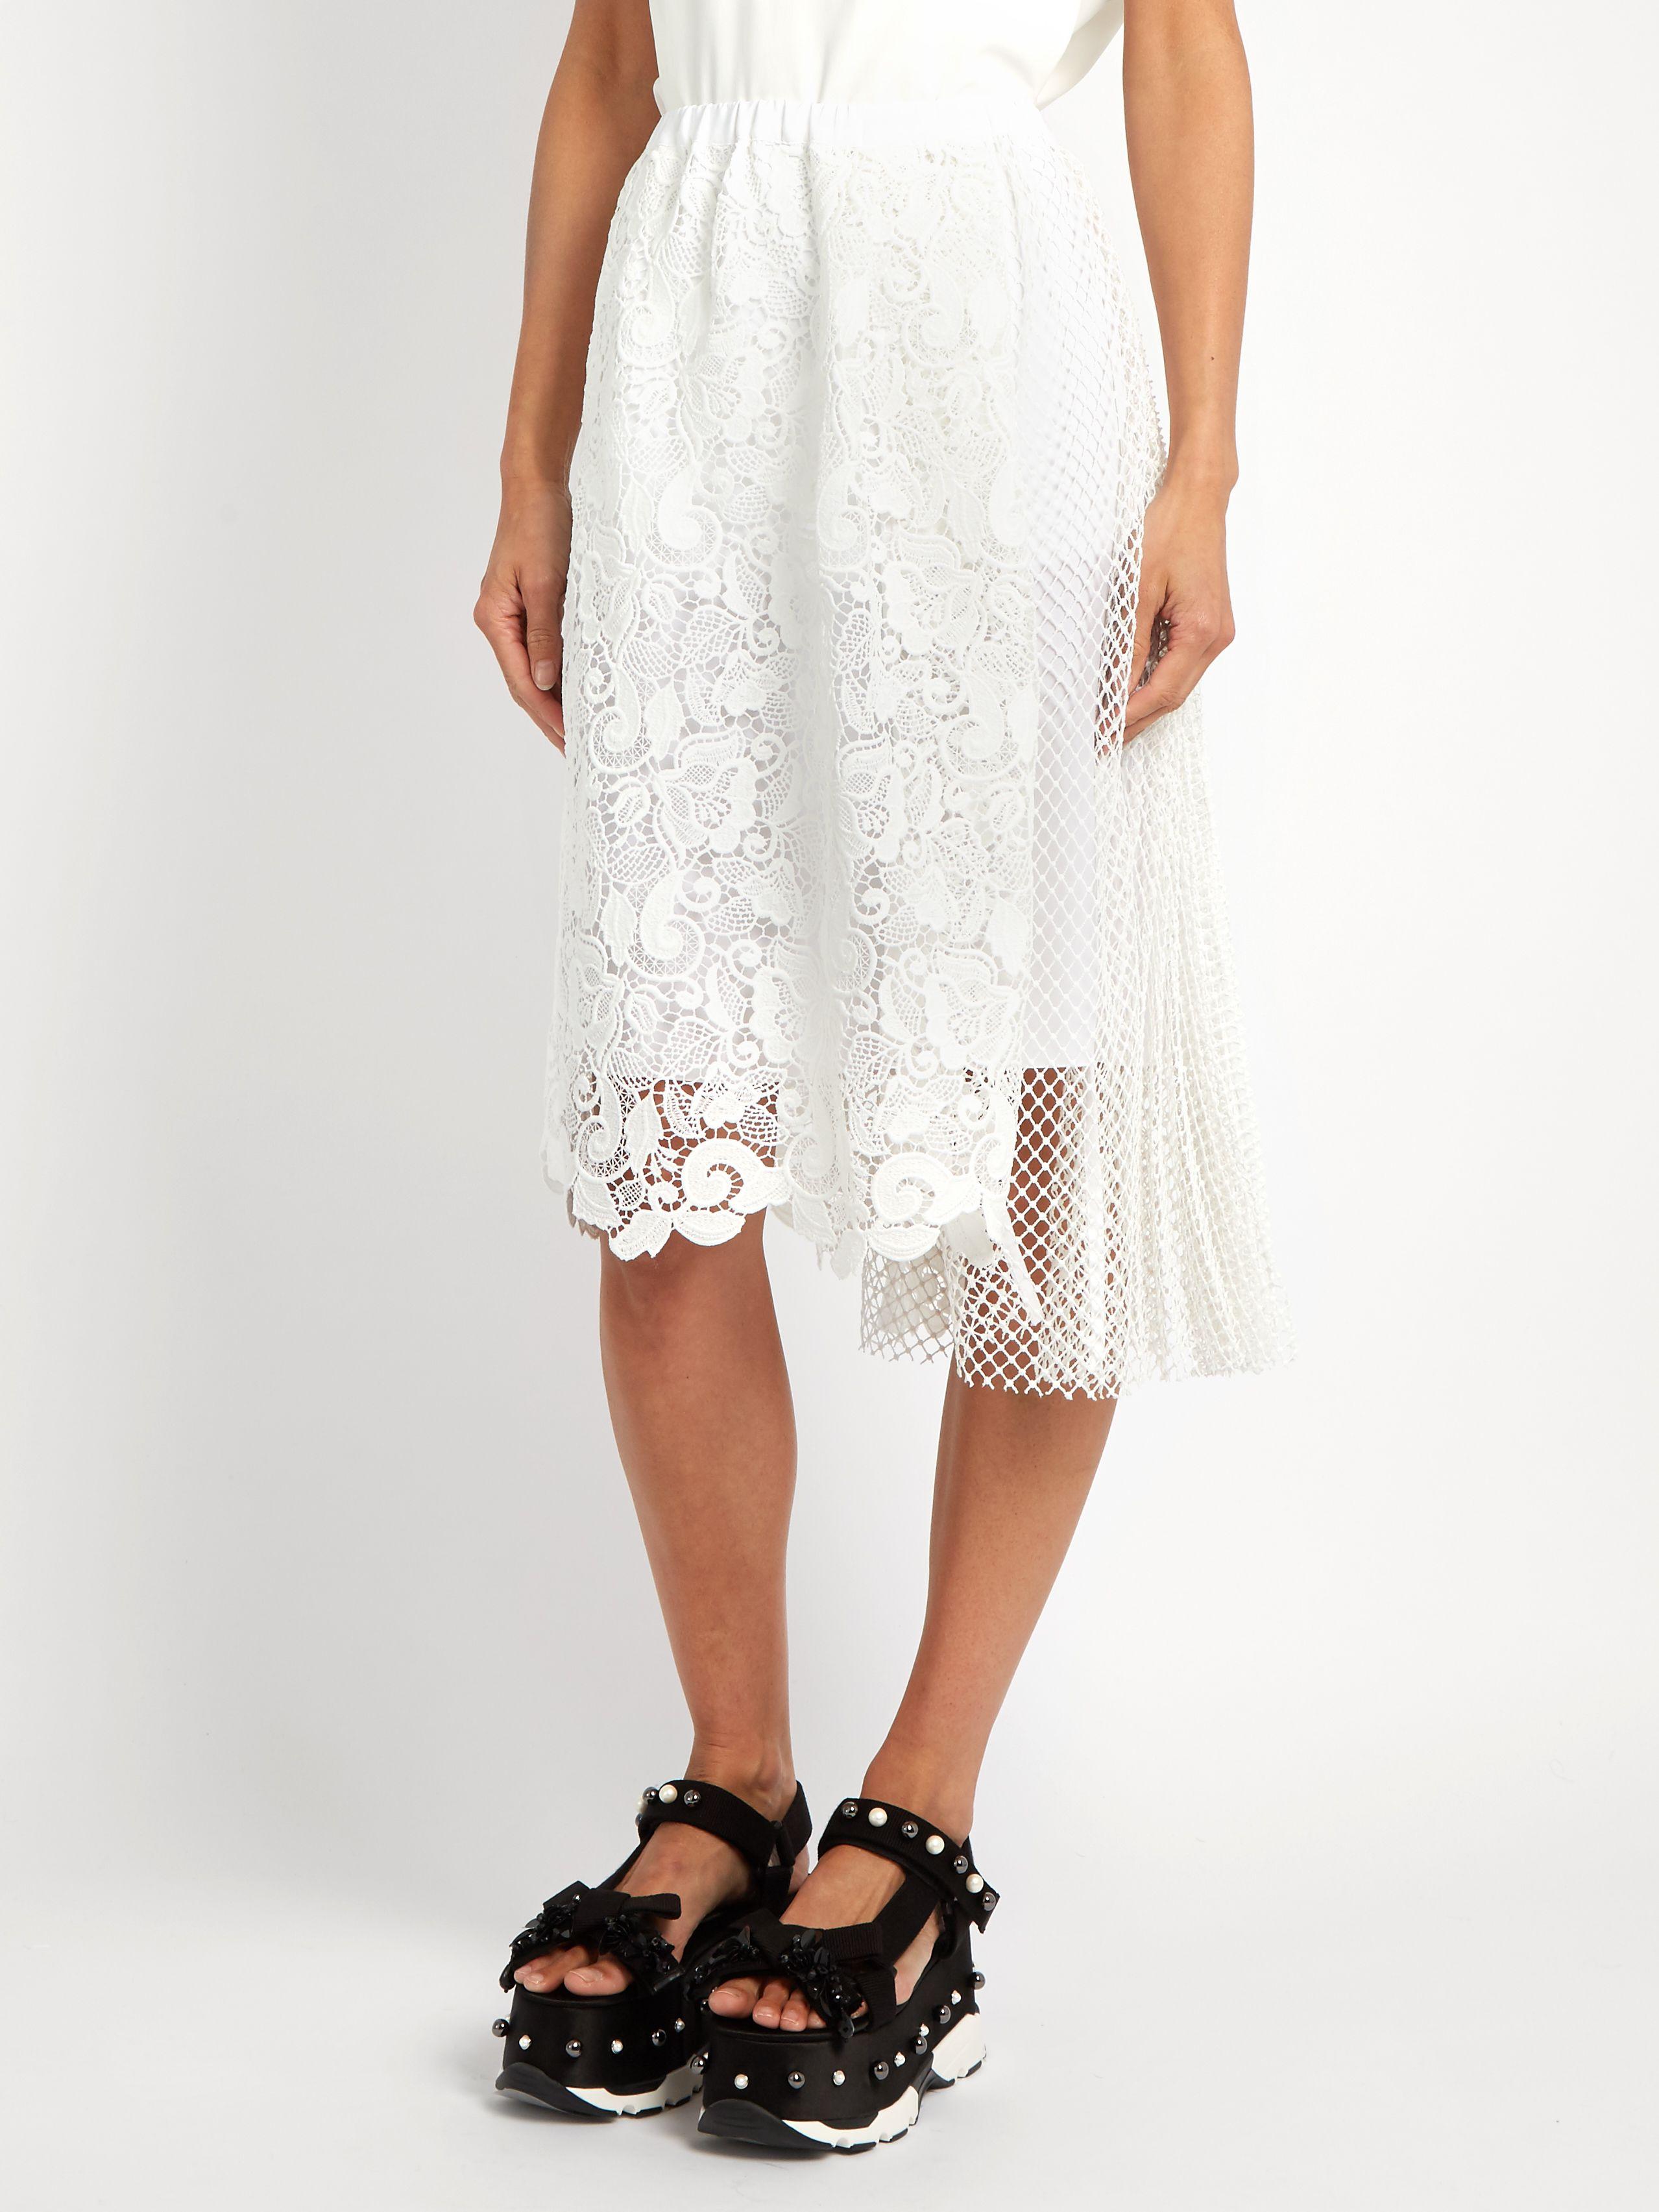 Click here to buy No. 21 Macramé-lace draped-panel skirt at MATCHESFASHION.COM